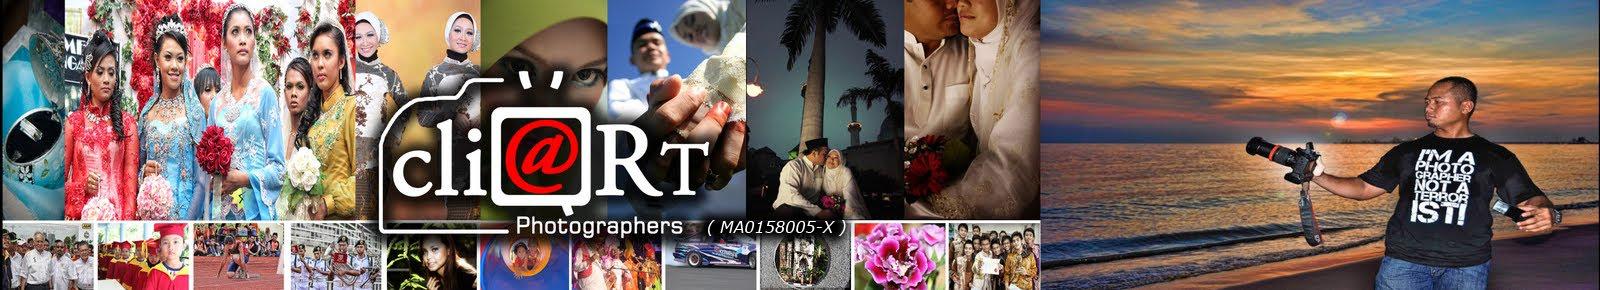 Cliqart Photographers